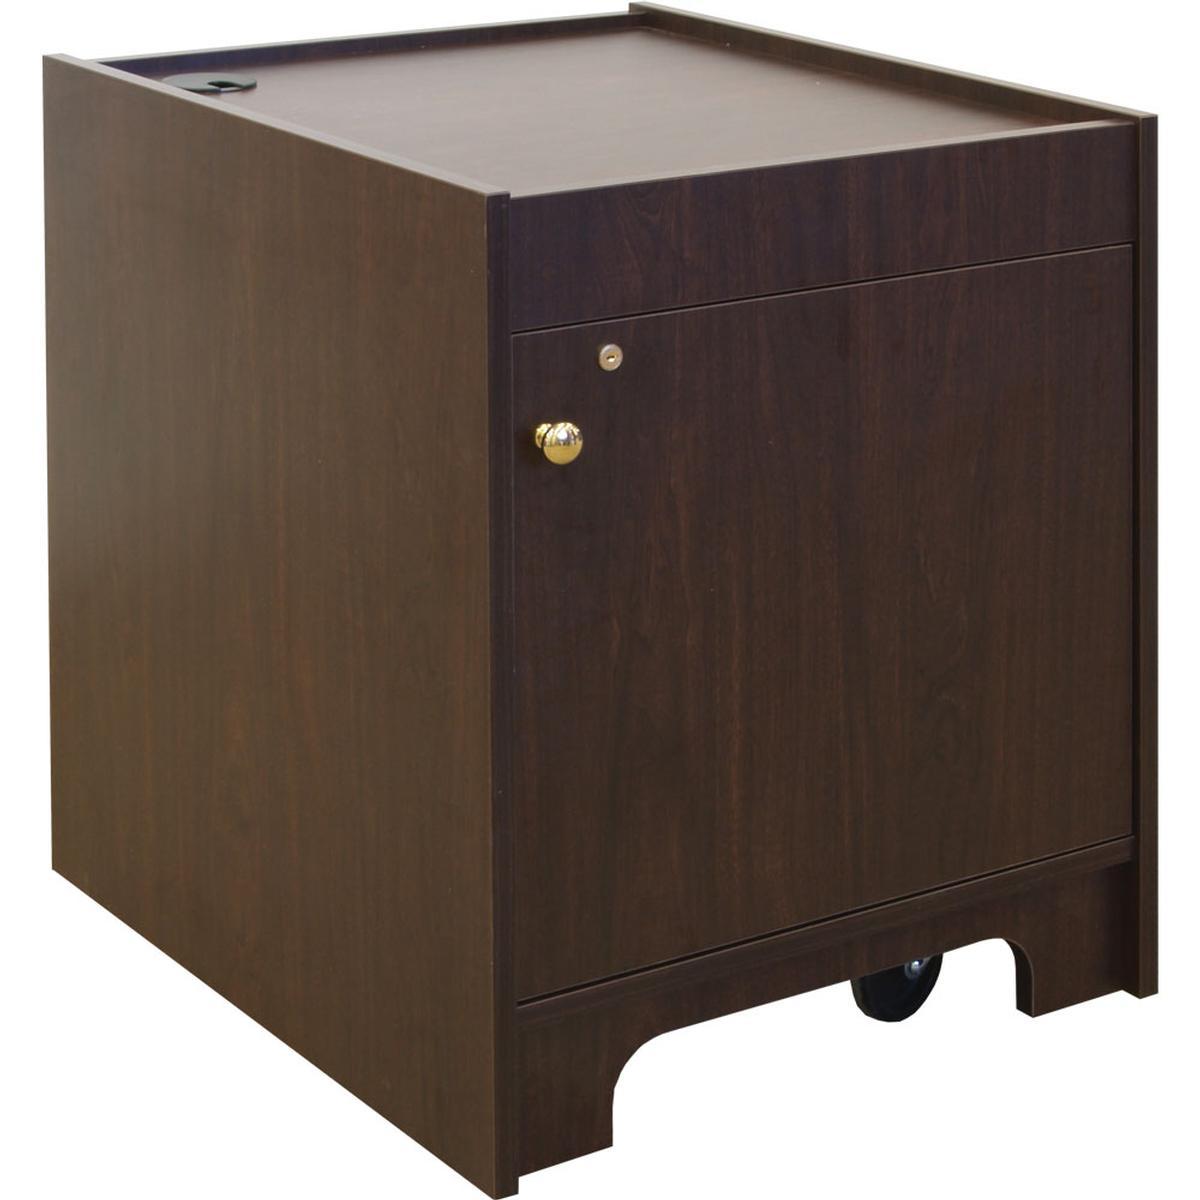 Elco 11ru Marshall Furniture Quick Ship Mobile Rack